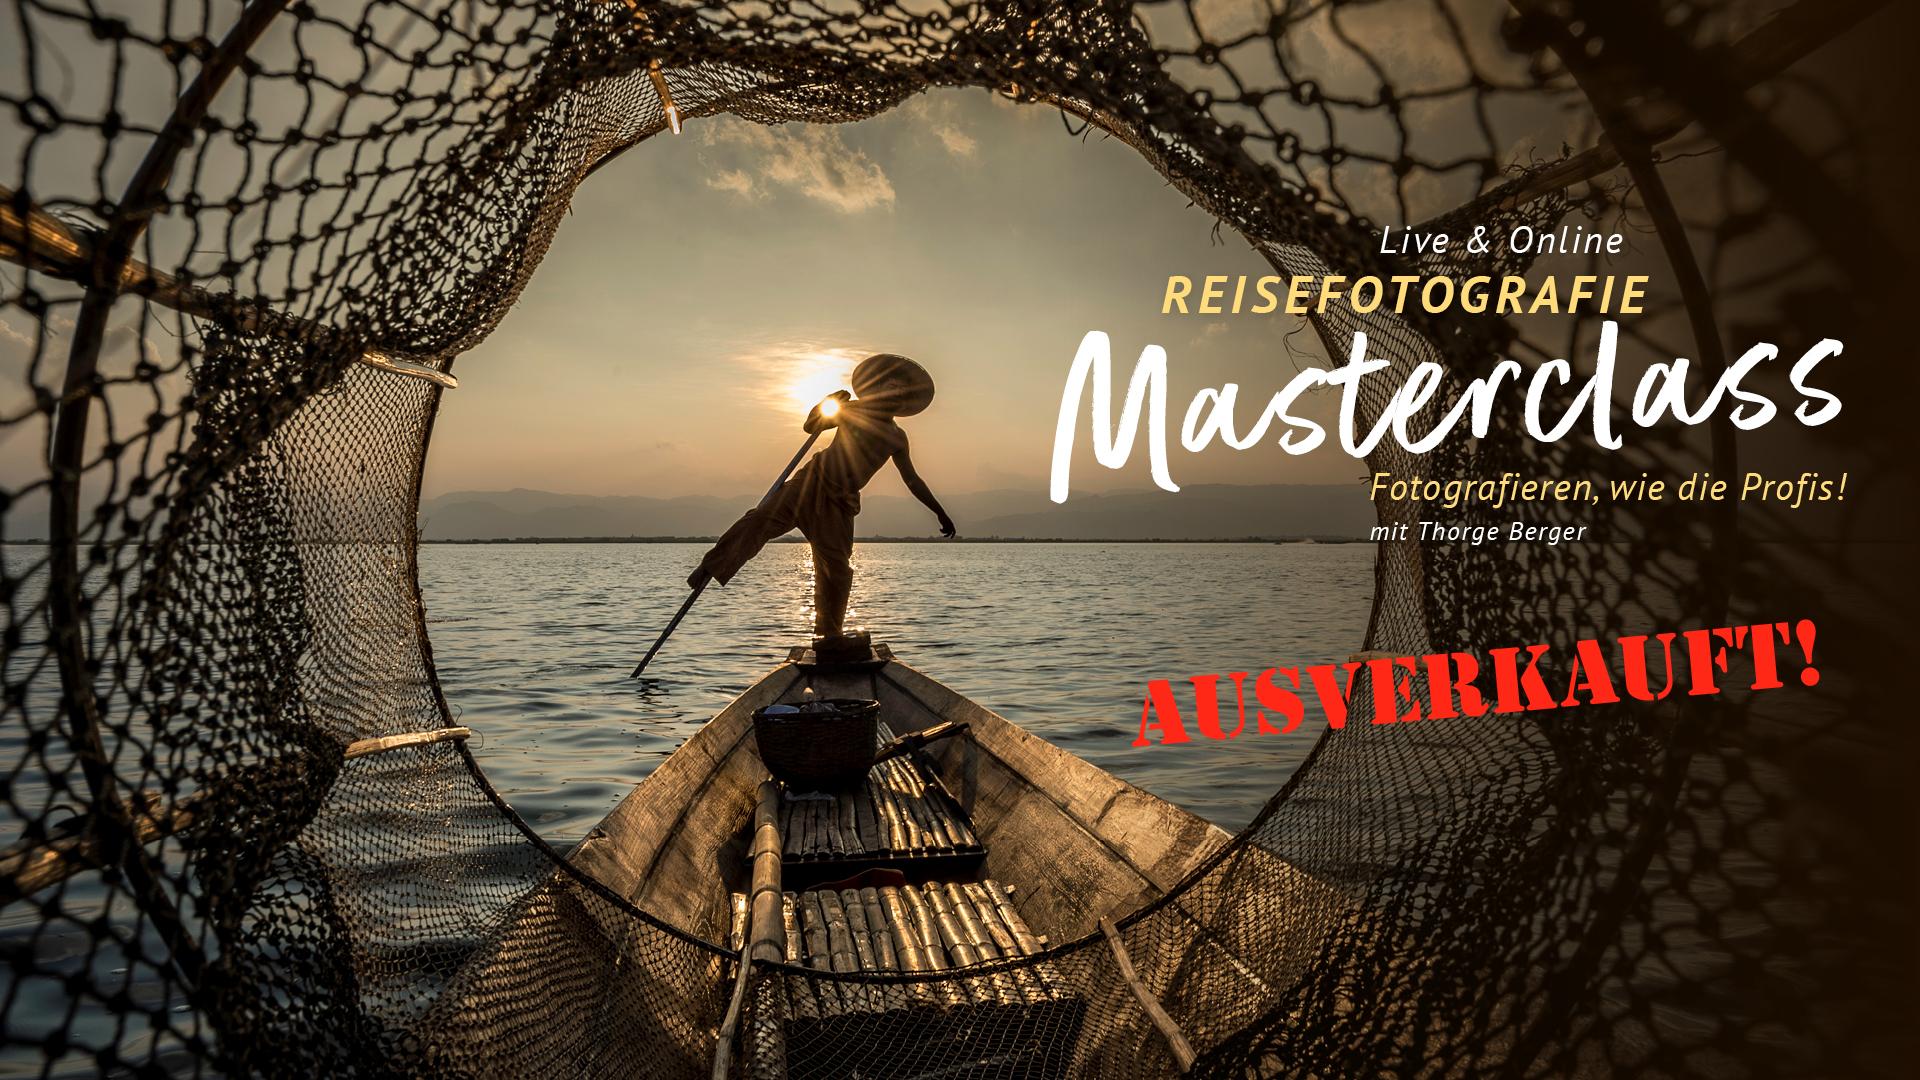 Permalink zu:Reisefotografie Masterclass